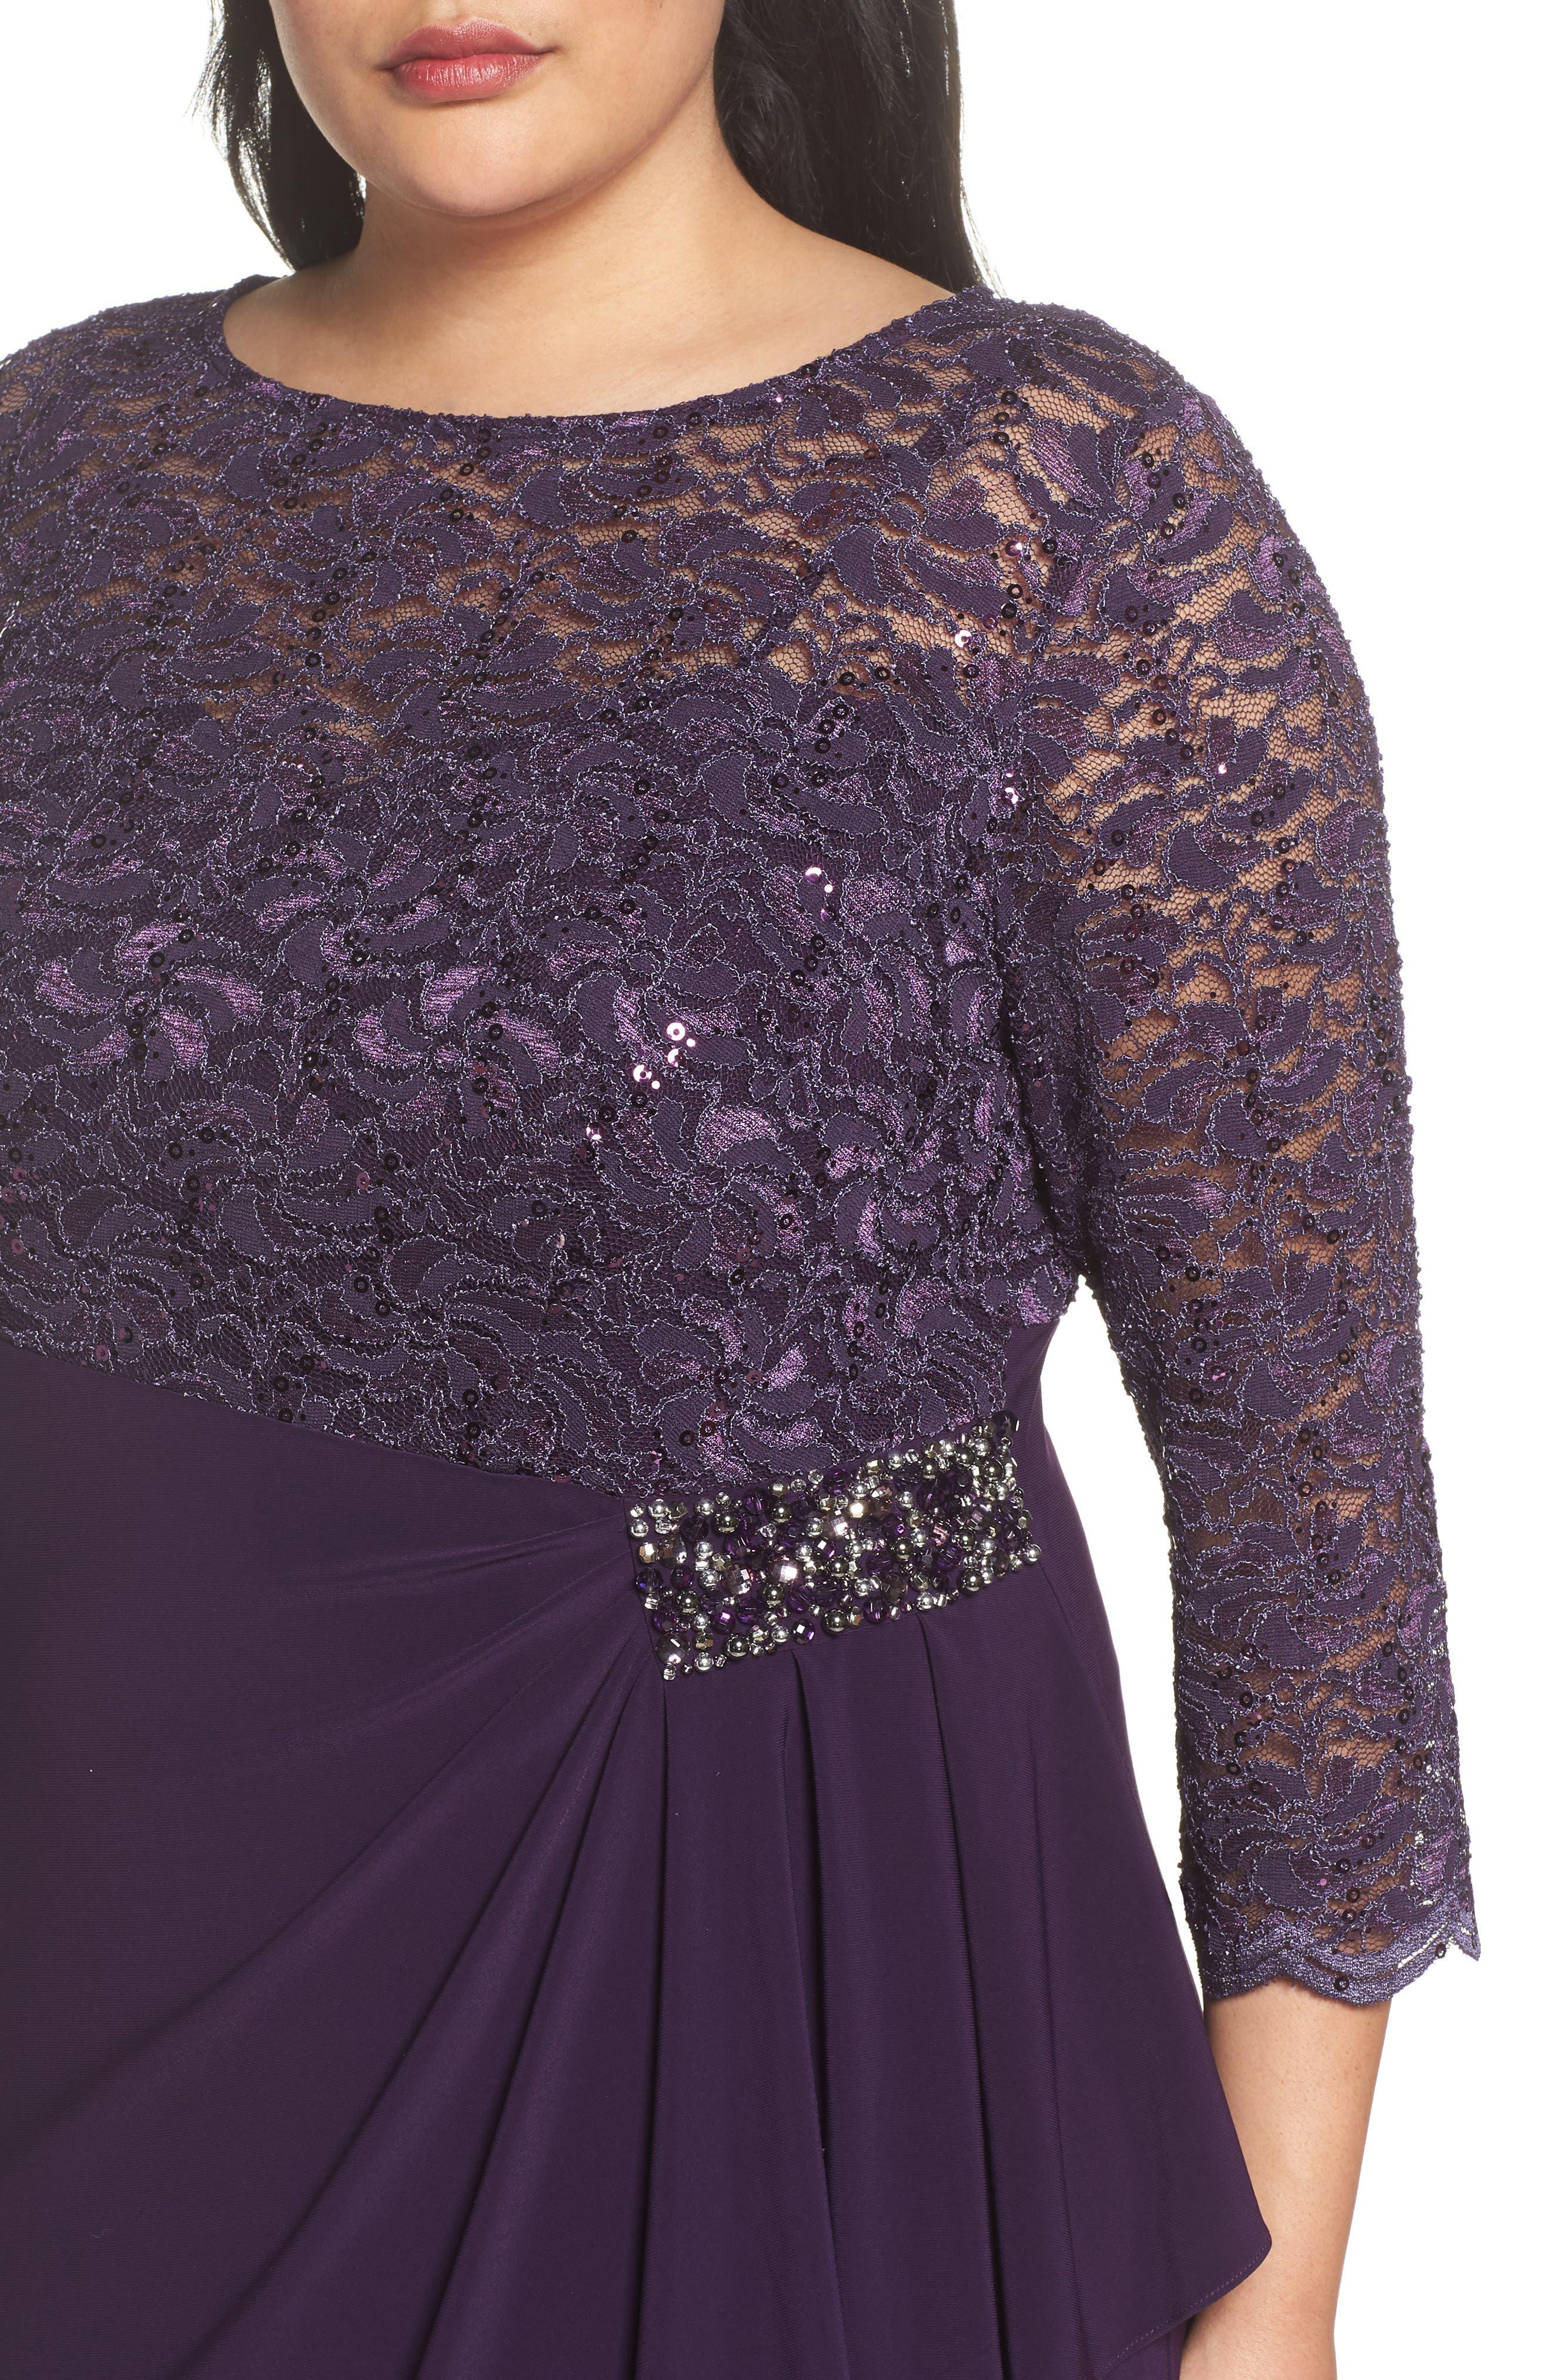 Embellished Ruffle Detail Shift Dress,                             Alternate thumbnail 4, color,                             Eggplant